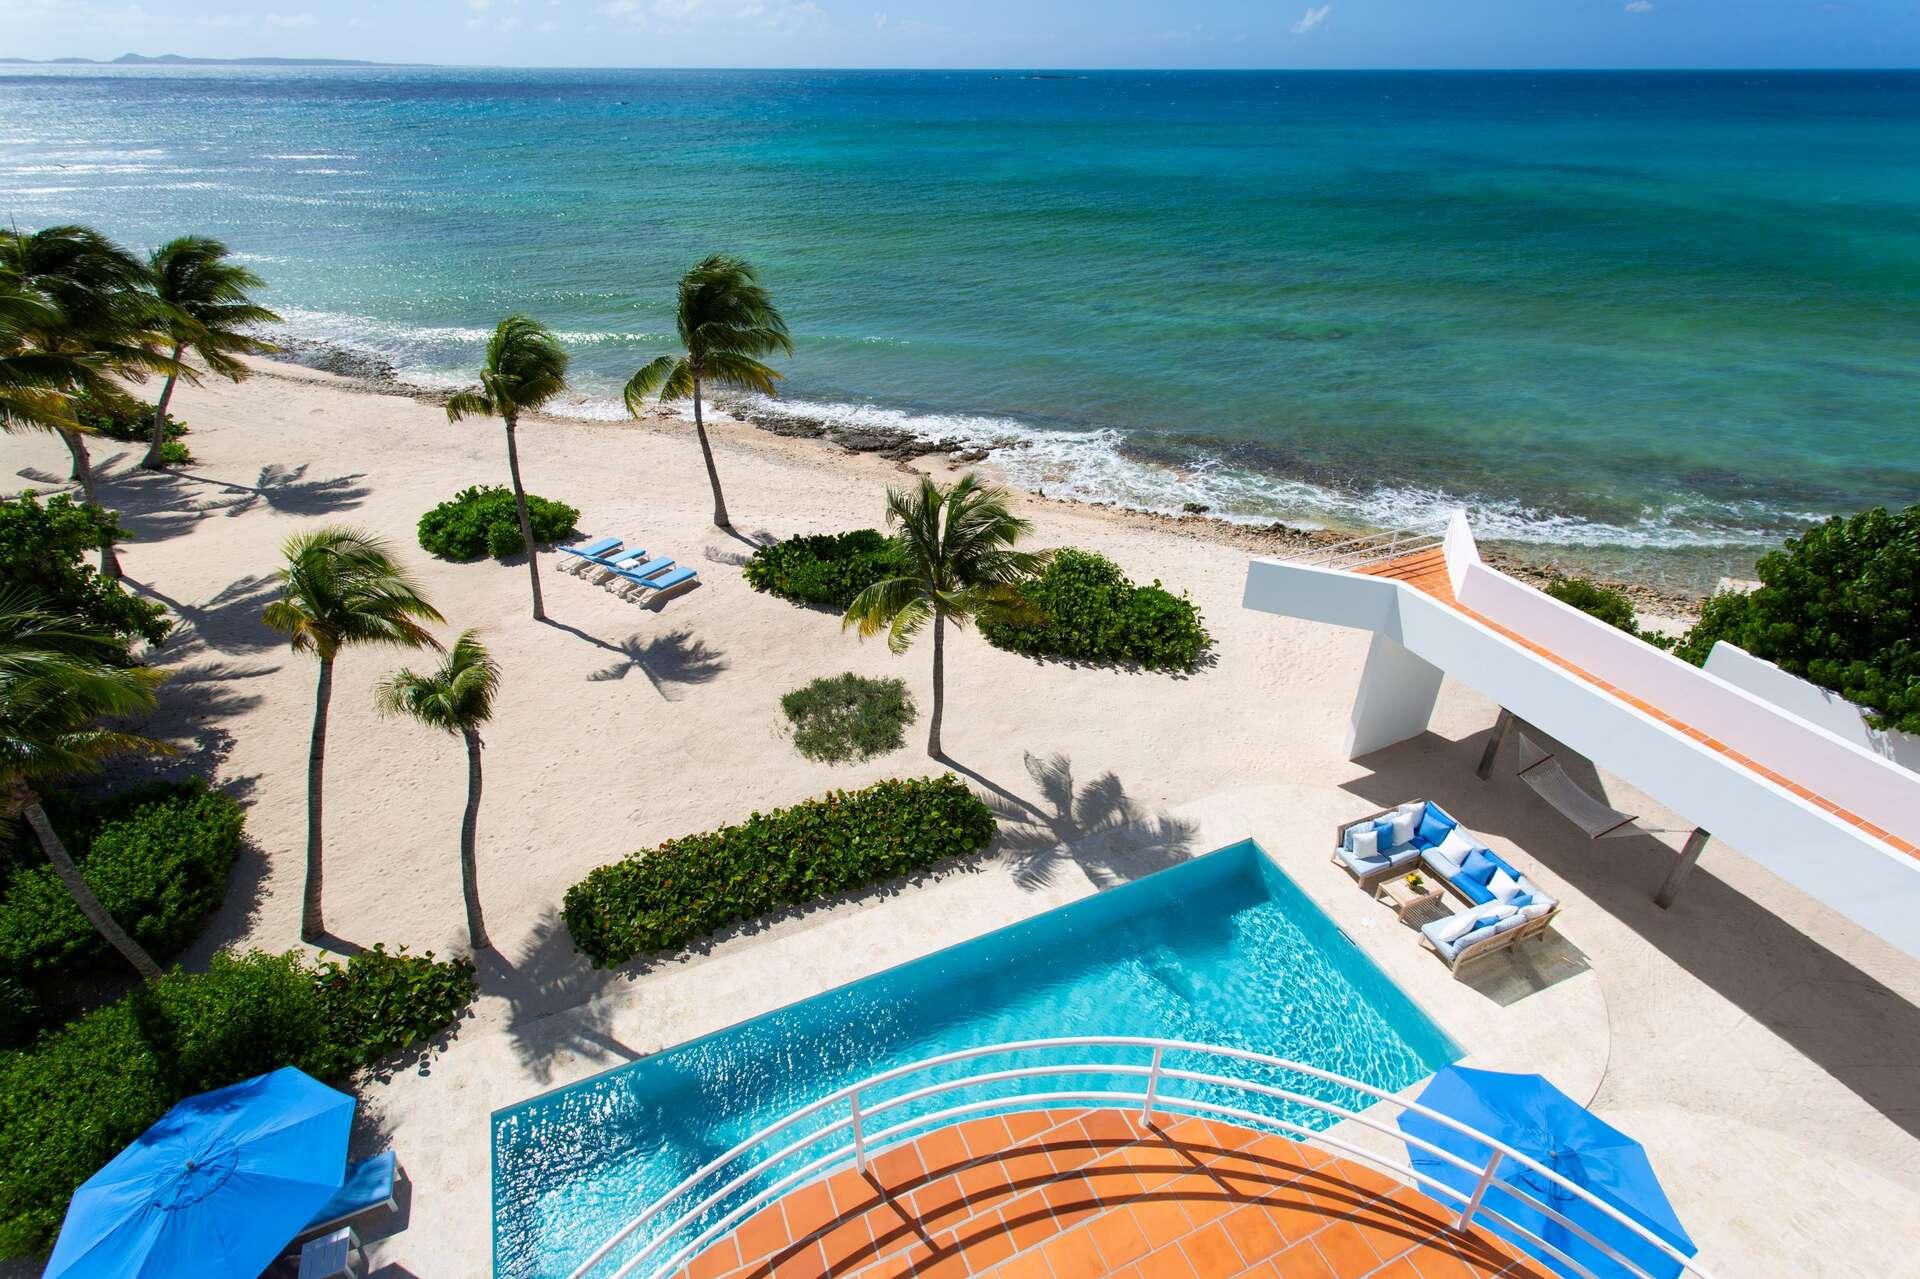 Luxury villa rentals caribbean - Anguilla - Altamer resort - Antilles Pearl - Image 1/17